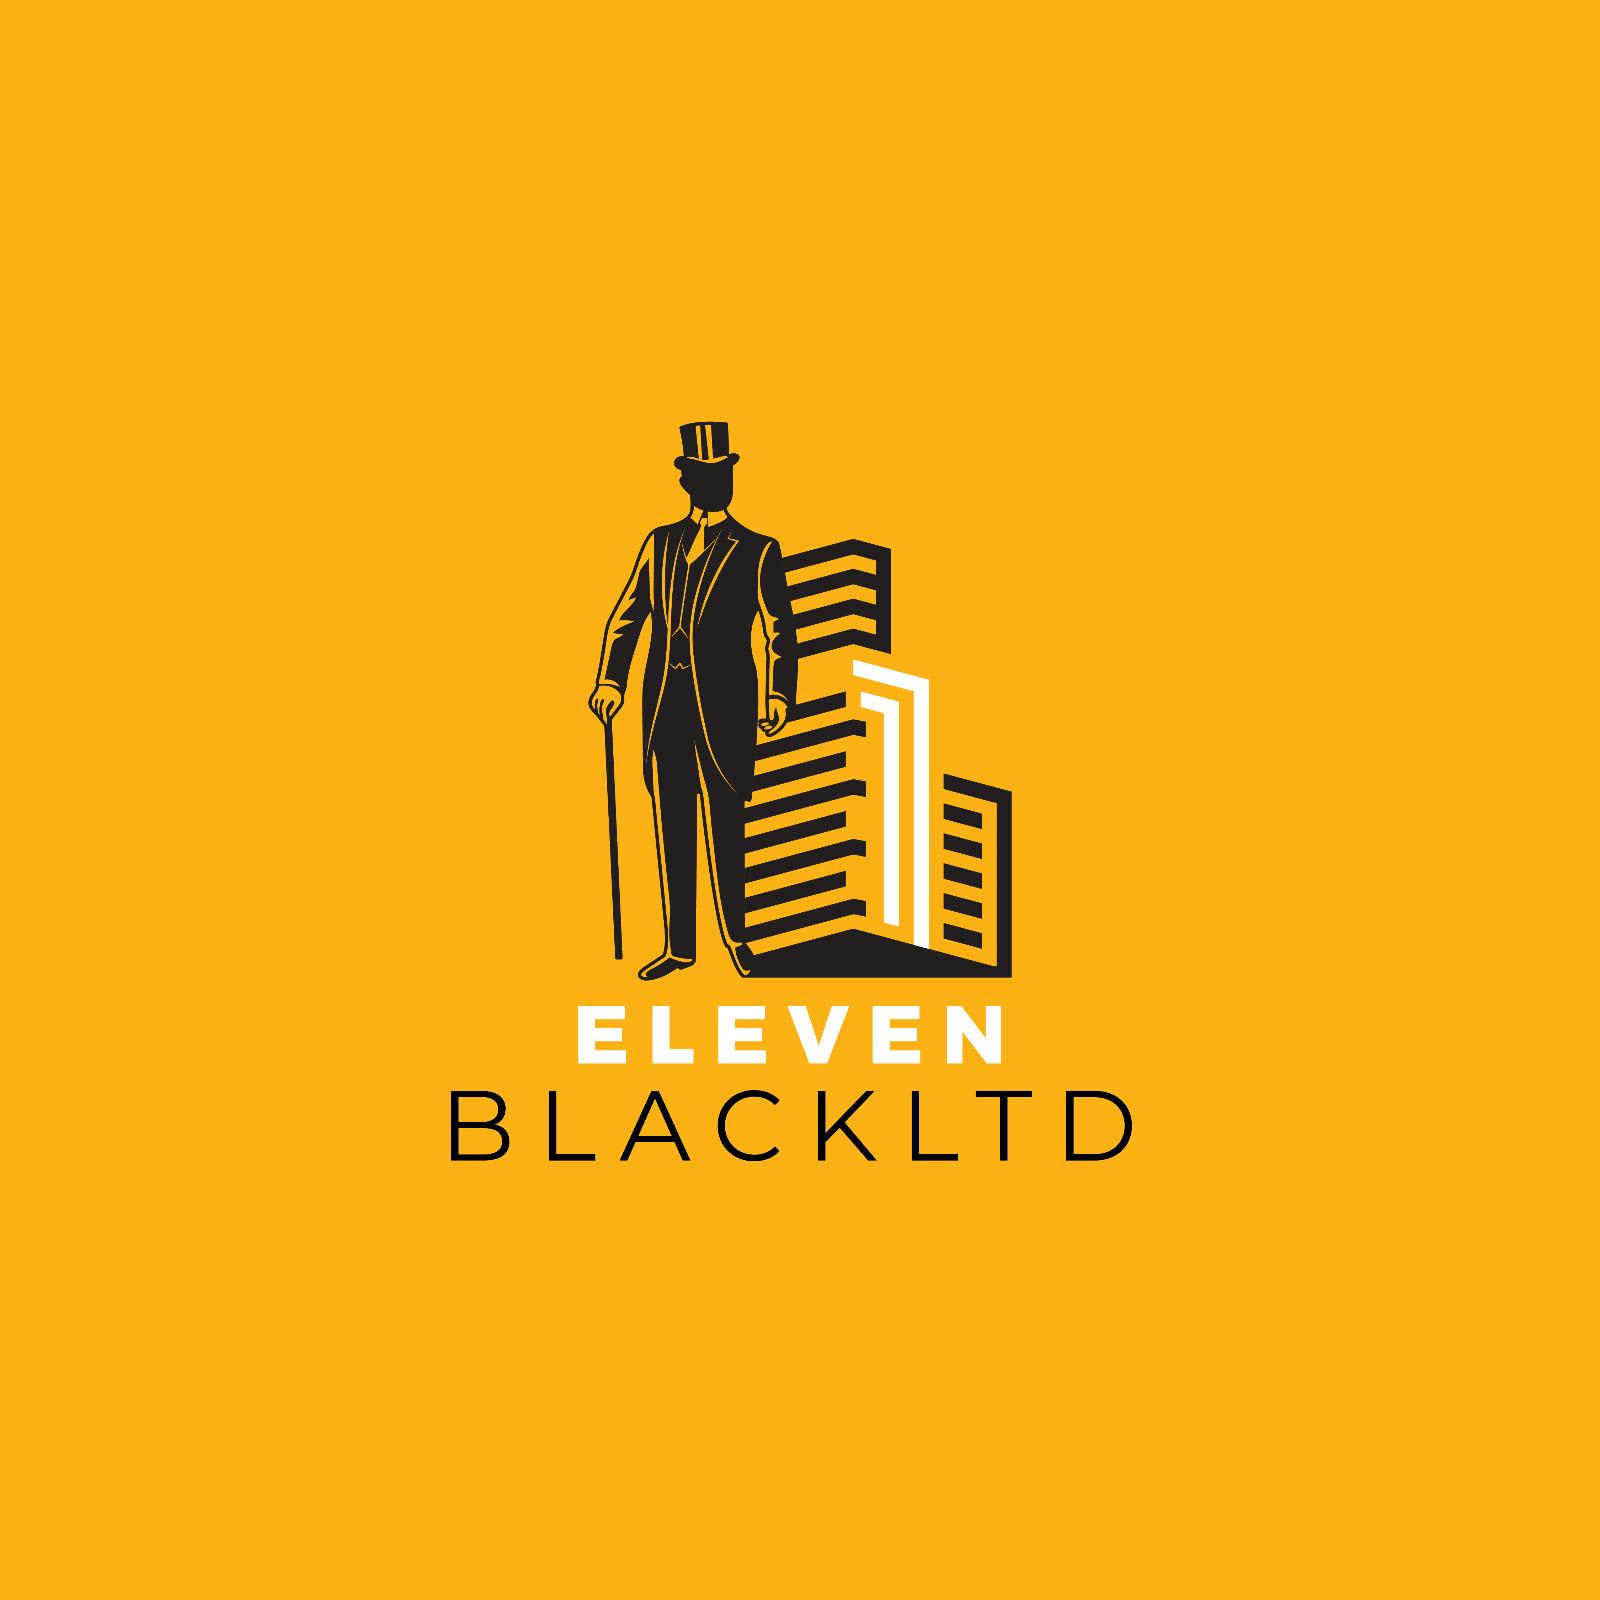 ElevenBlack Ltd